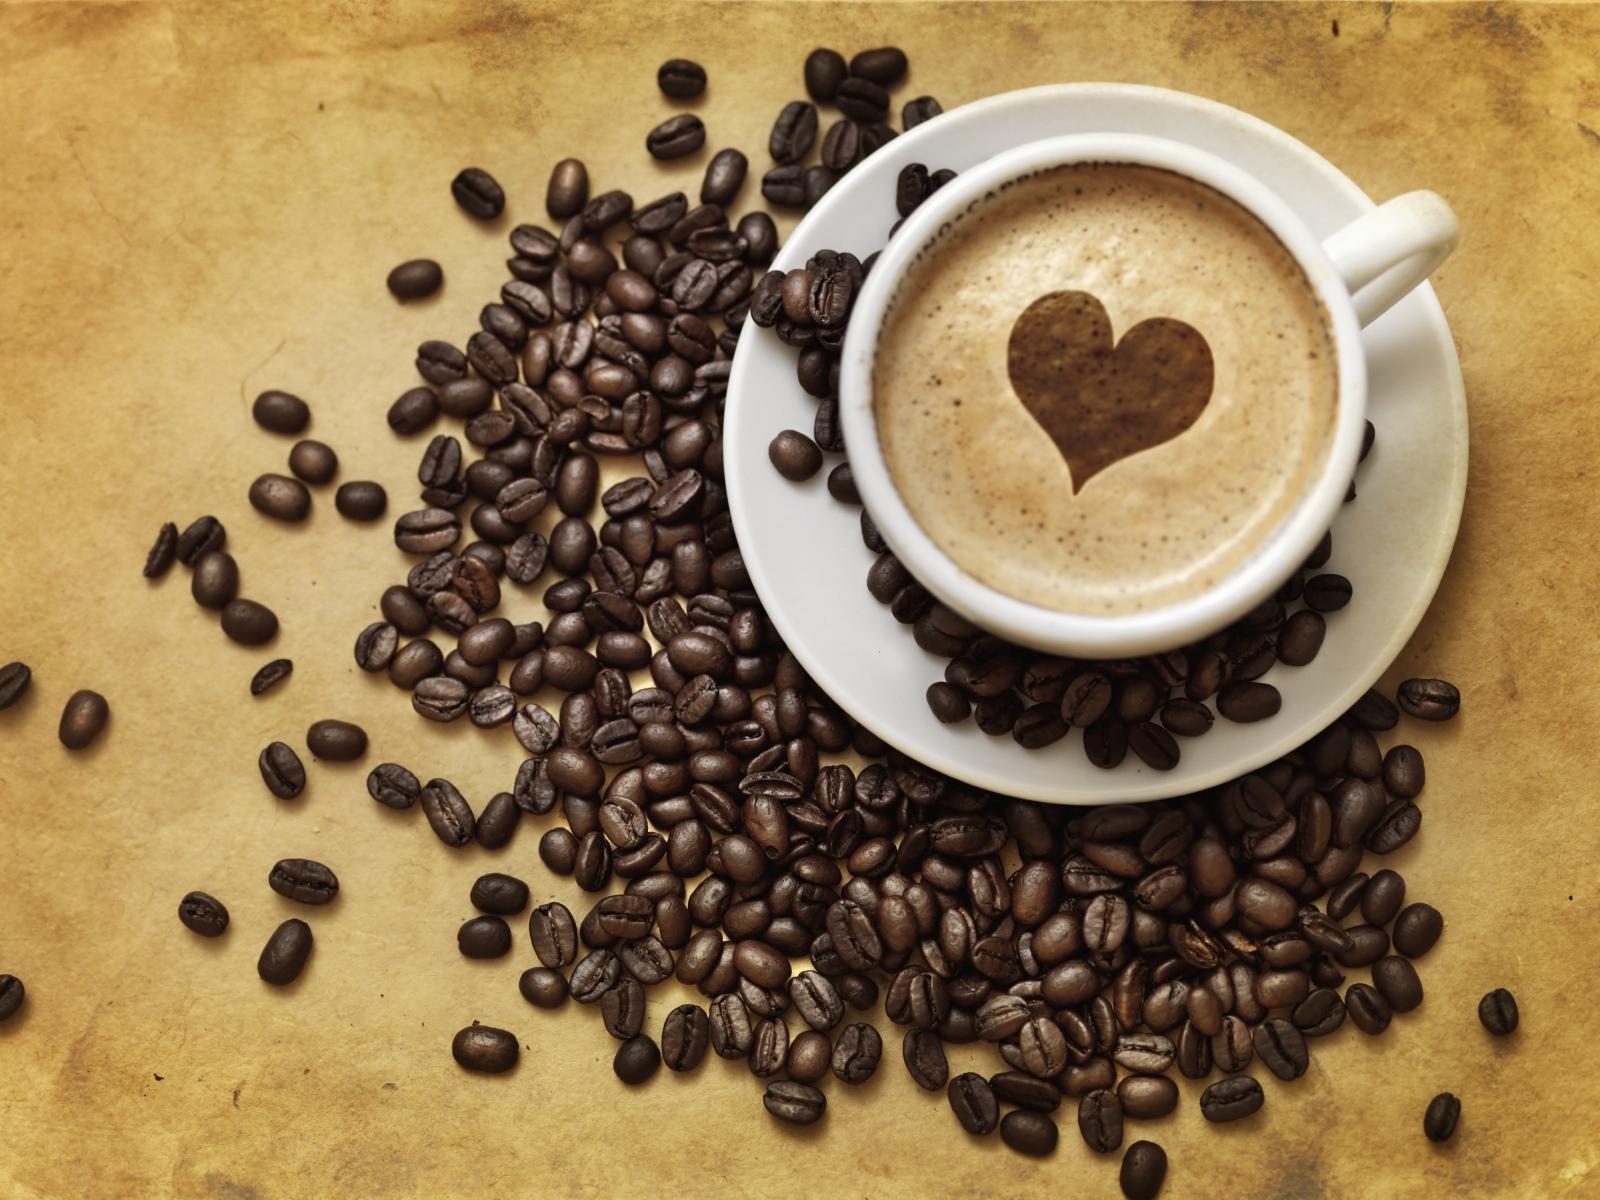 9 Surprising Benefits of Drinking Coffee